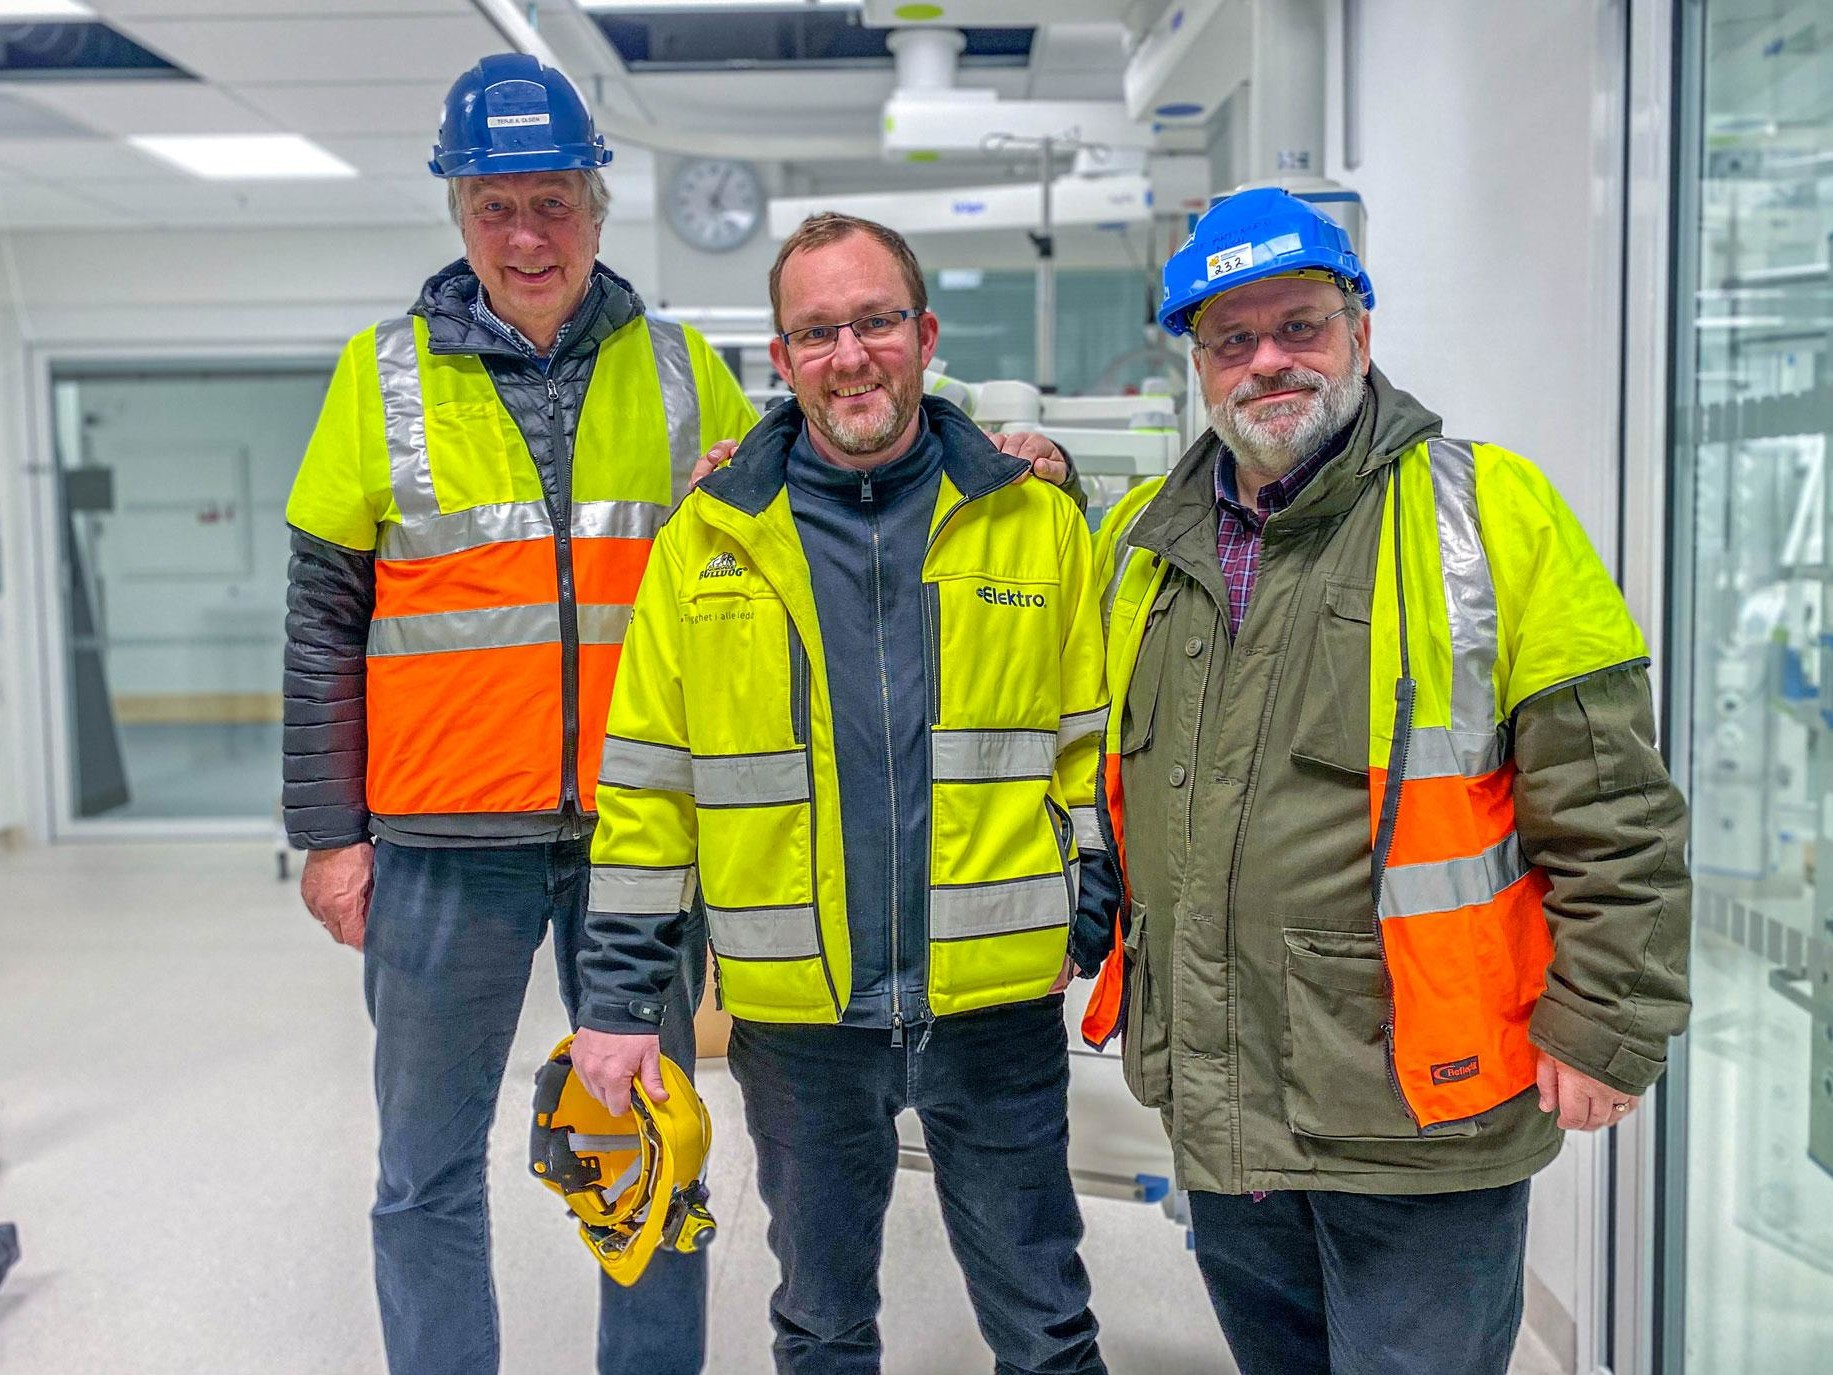 Terje Arthur Olsen, Wiggo Bjørnerud og Helge Antonsen, alle fra Elektro, på nordlandssykehuset